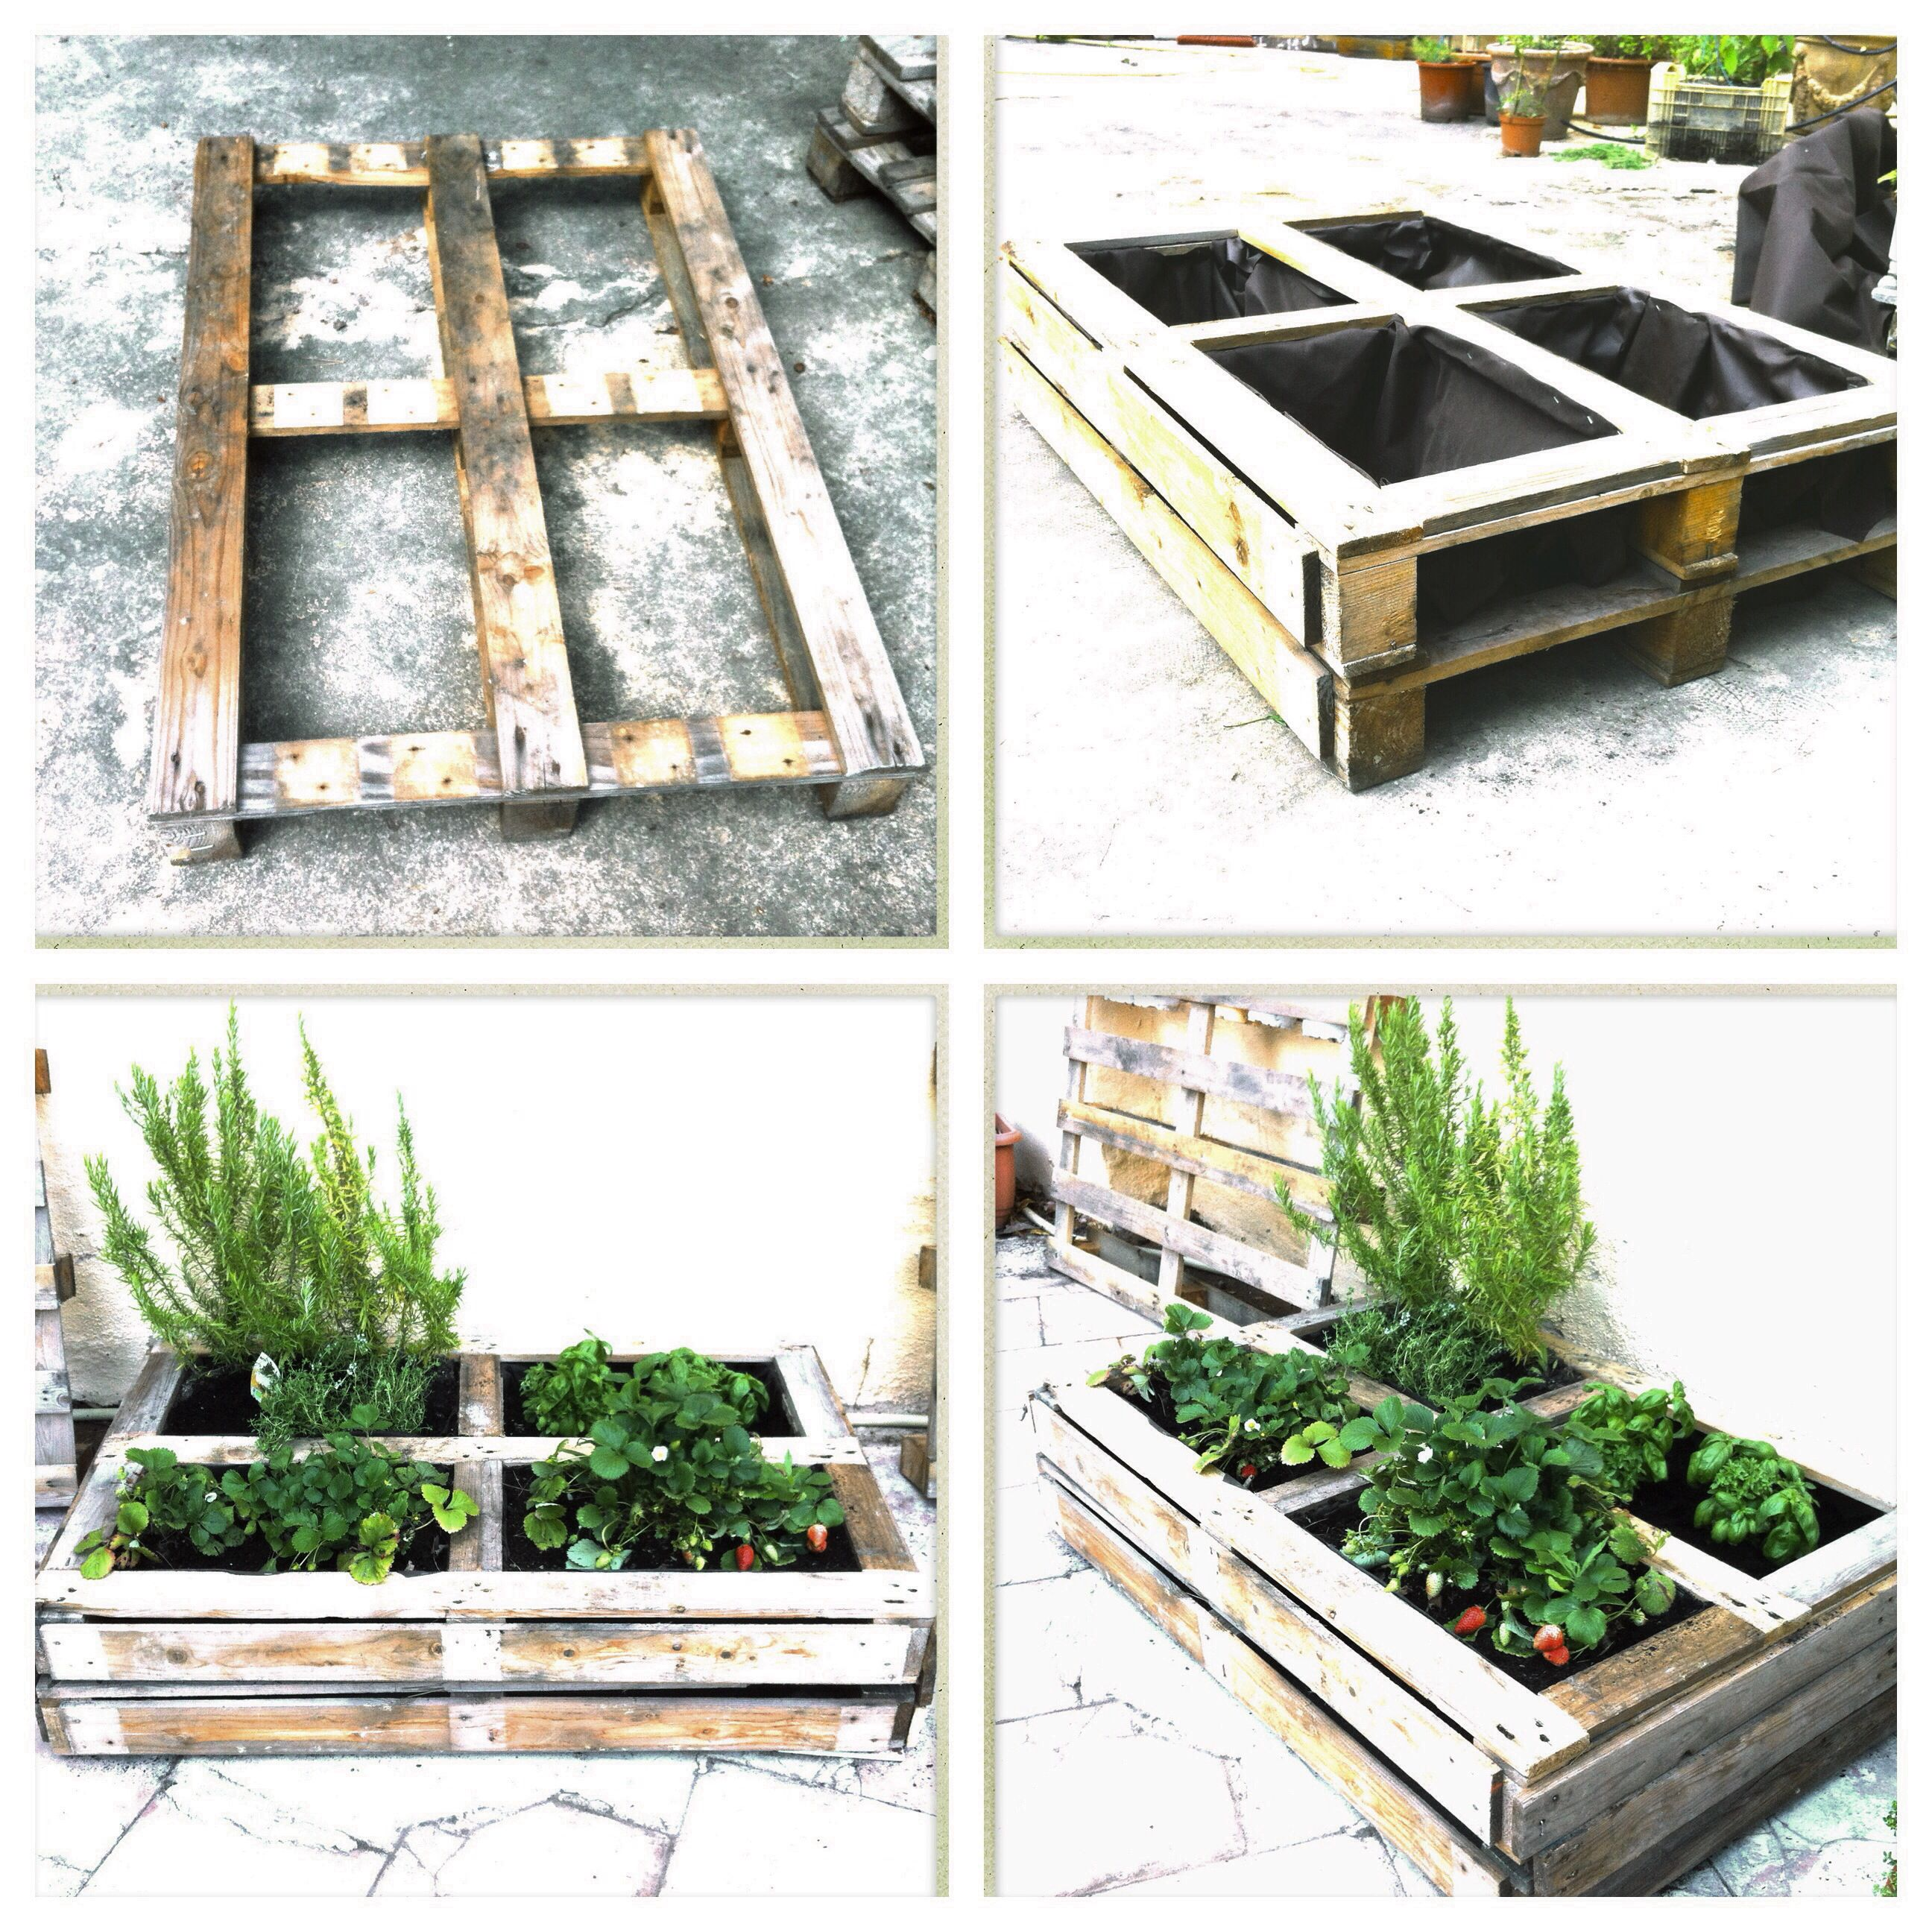 Recycled wooden pallet garden peque a jardinera hecha con - Jardineras con palets ...